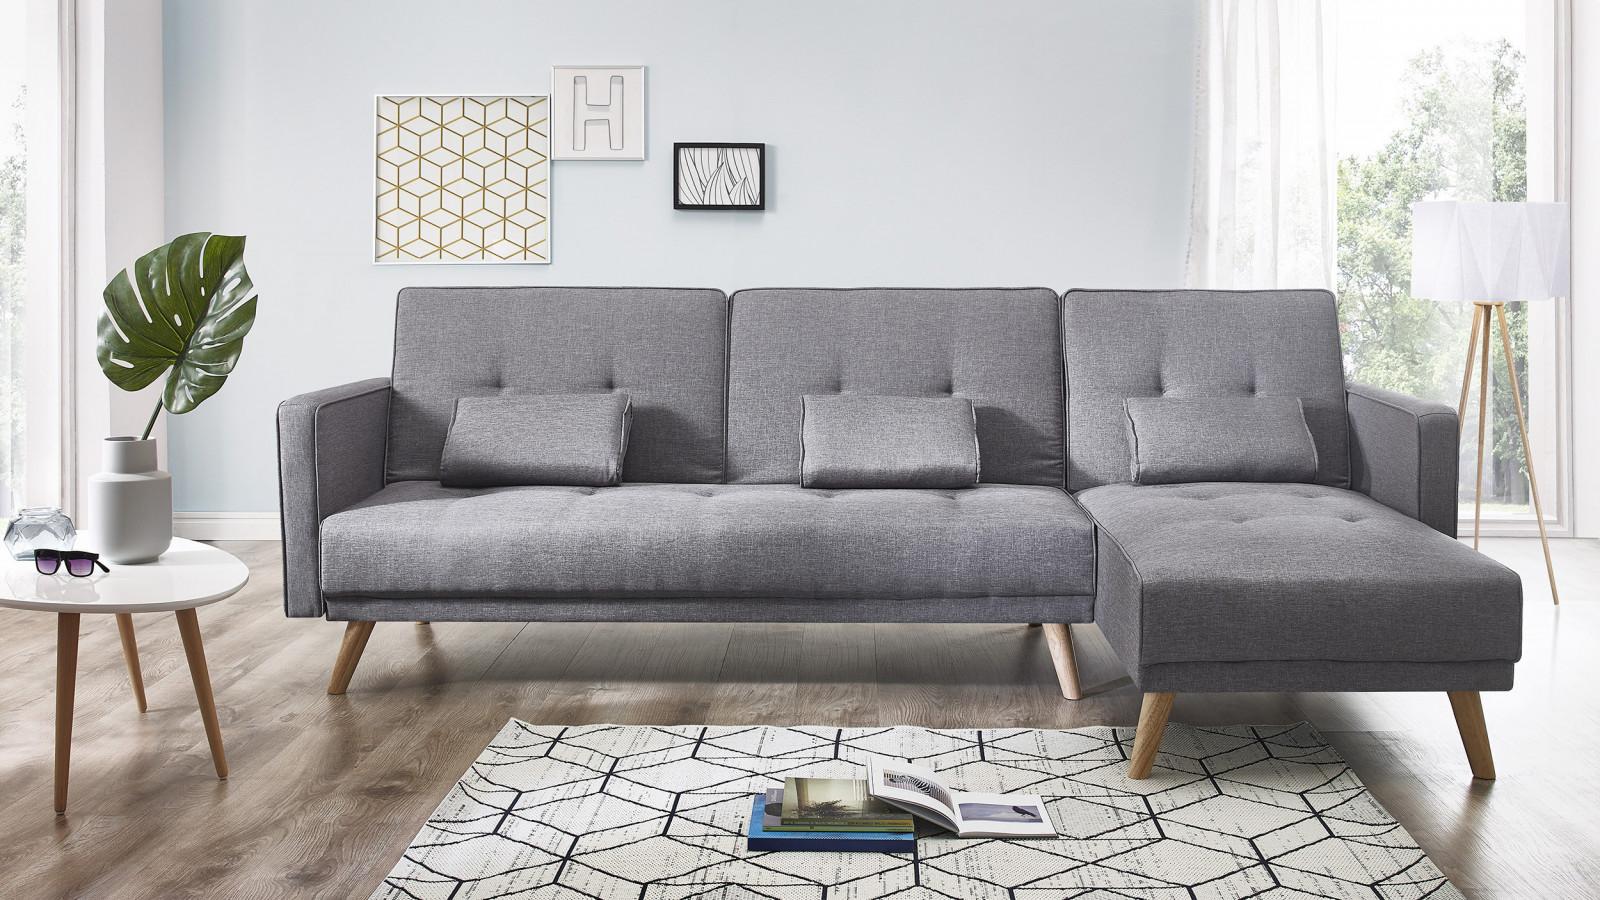 ecksofa design amazing sofa l form frisch leder l form ecksofa u form couch lilly sofa u with. Black Bedroom Furniture Sets. Home Design Ideas